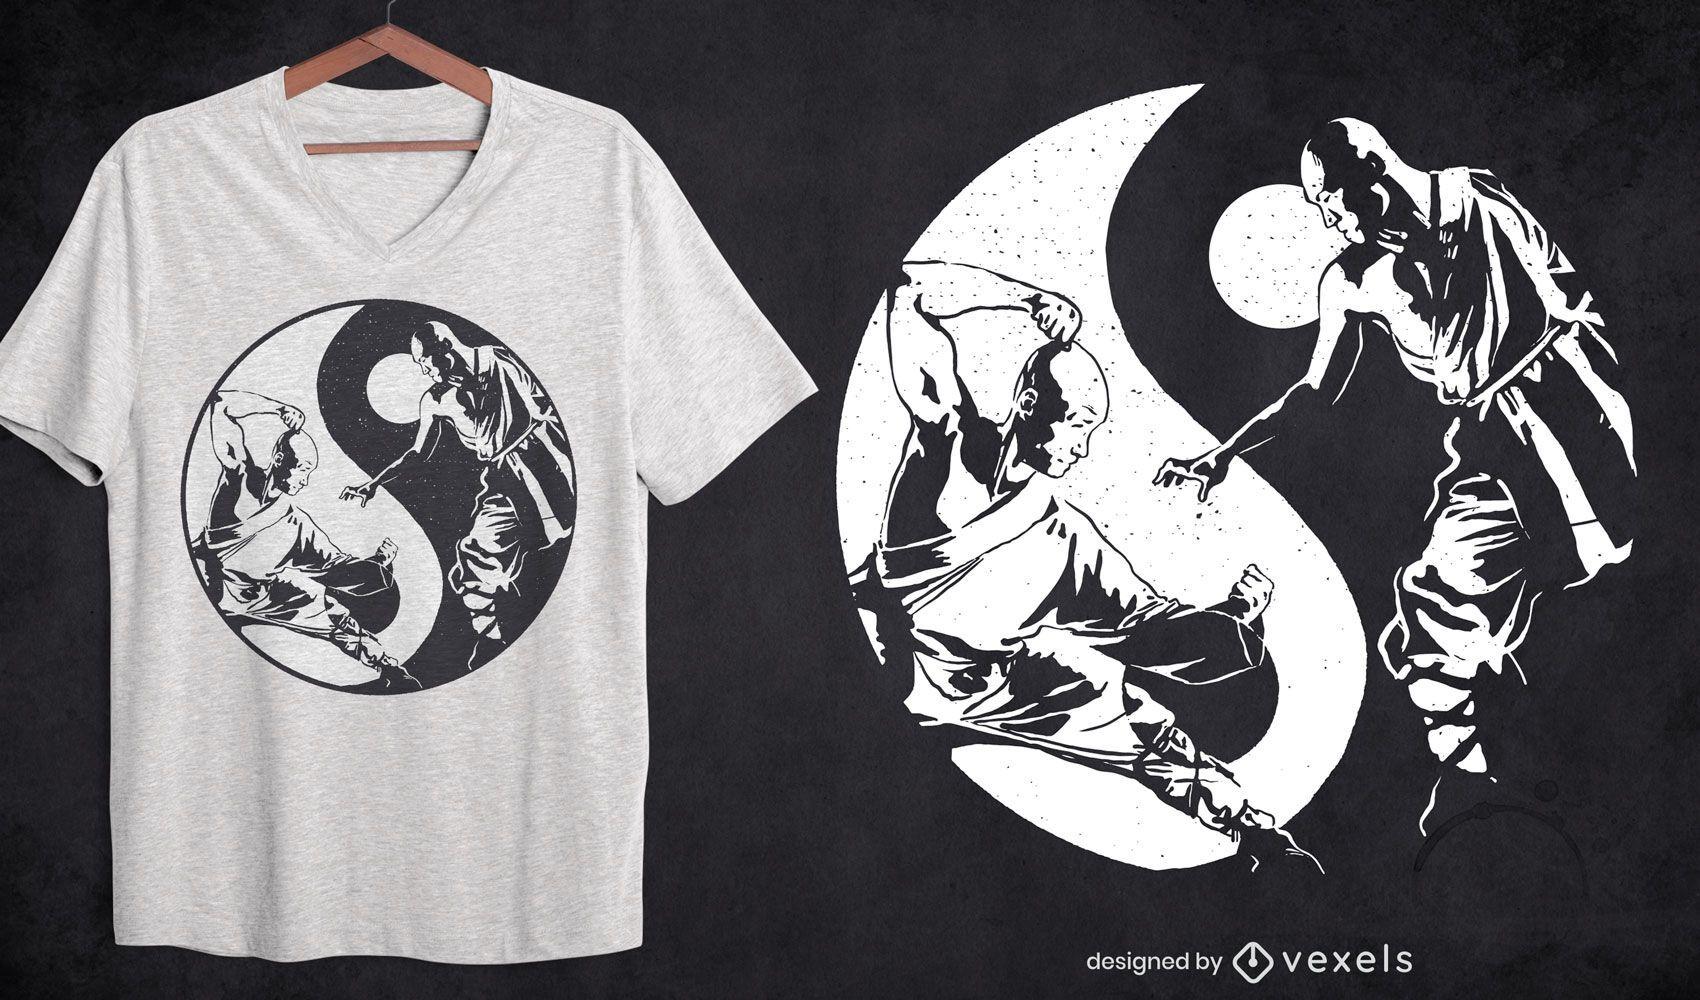 Dise?o de camiseta deportiva de artes marciales yin yang.